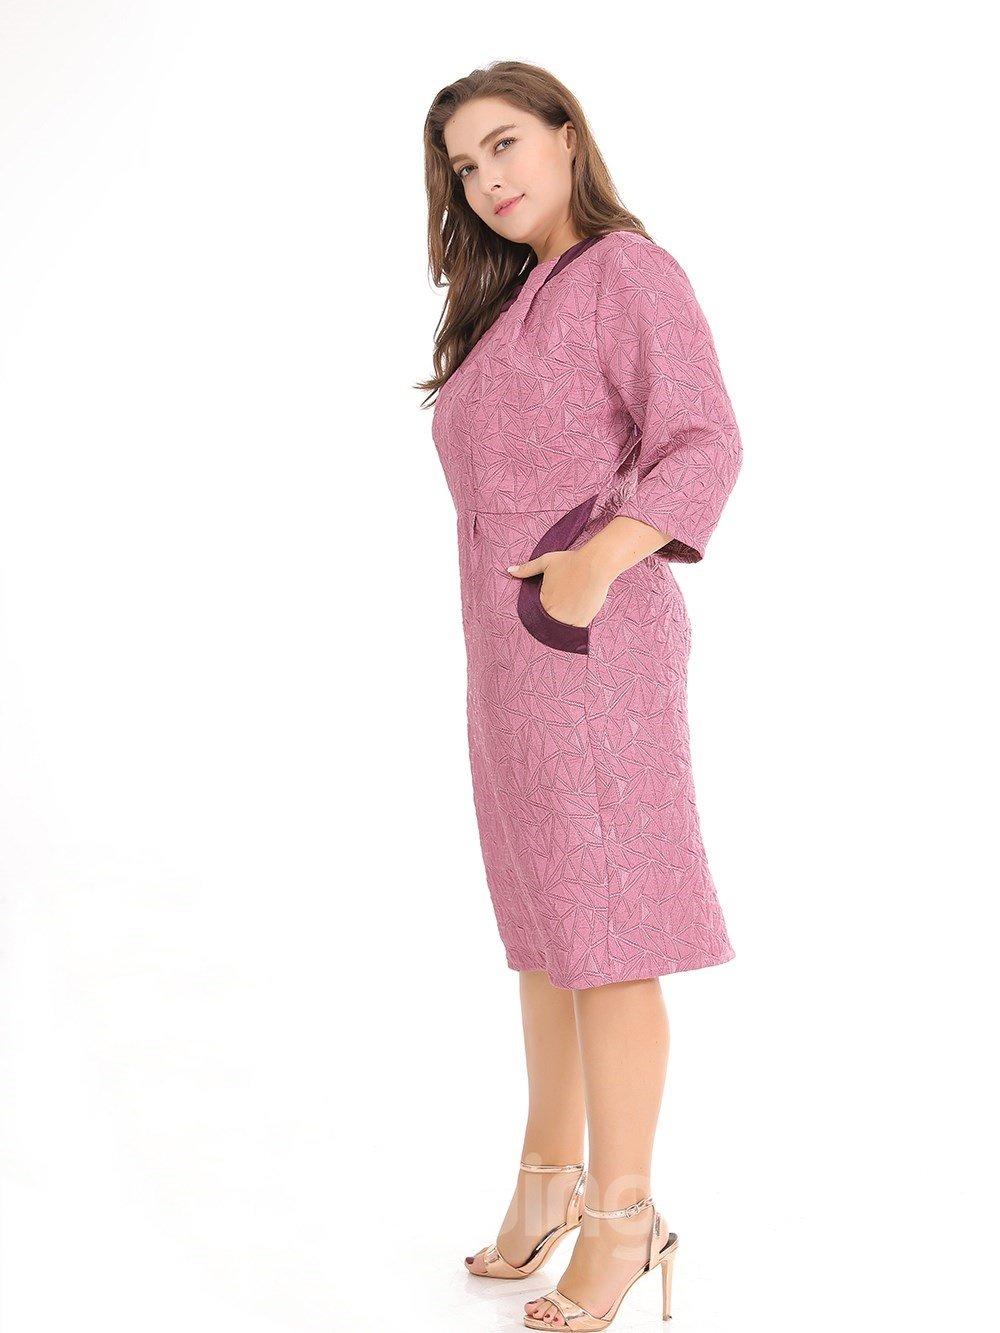 Slim Model Half Sleeve Nylon A-Line Silhouette Plus Size Dress